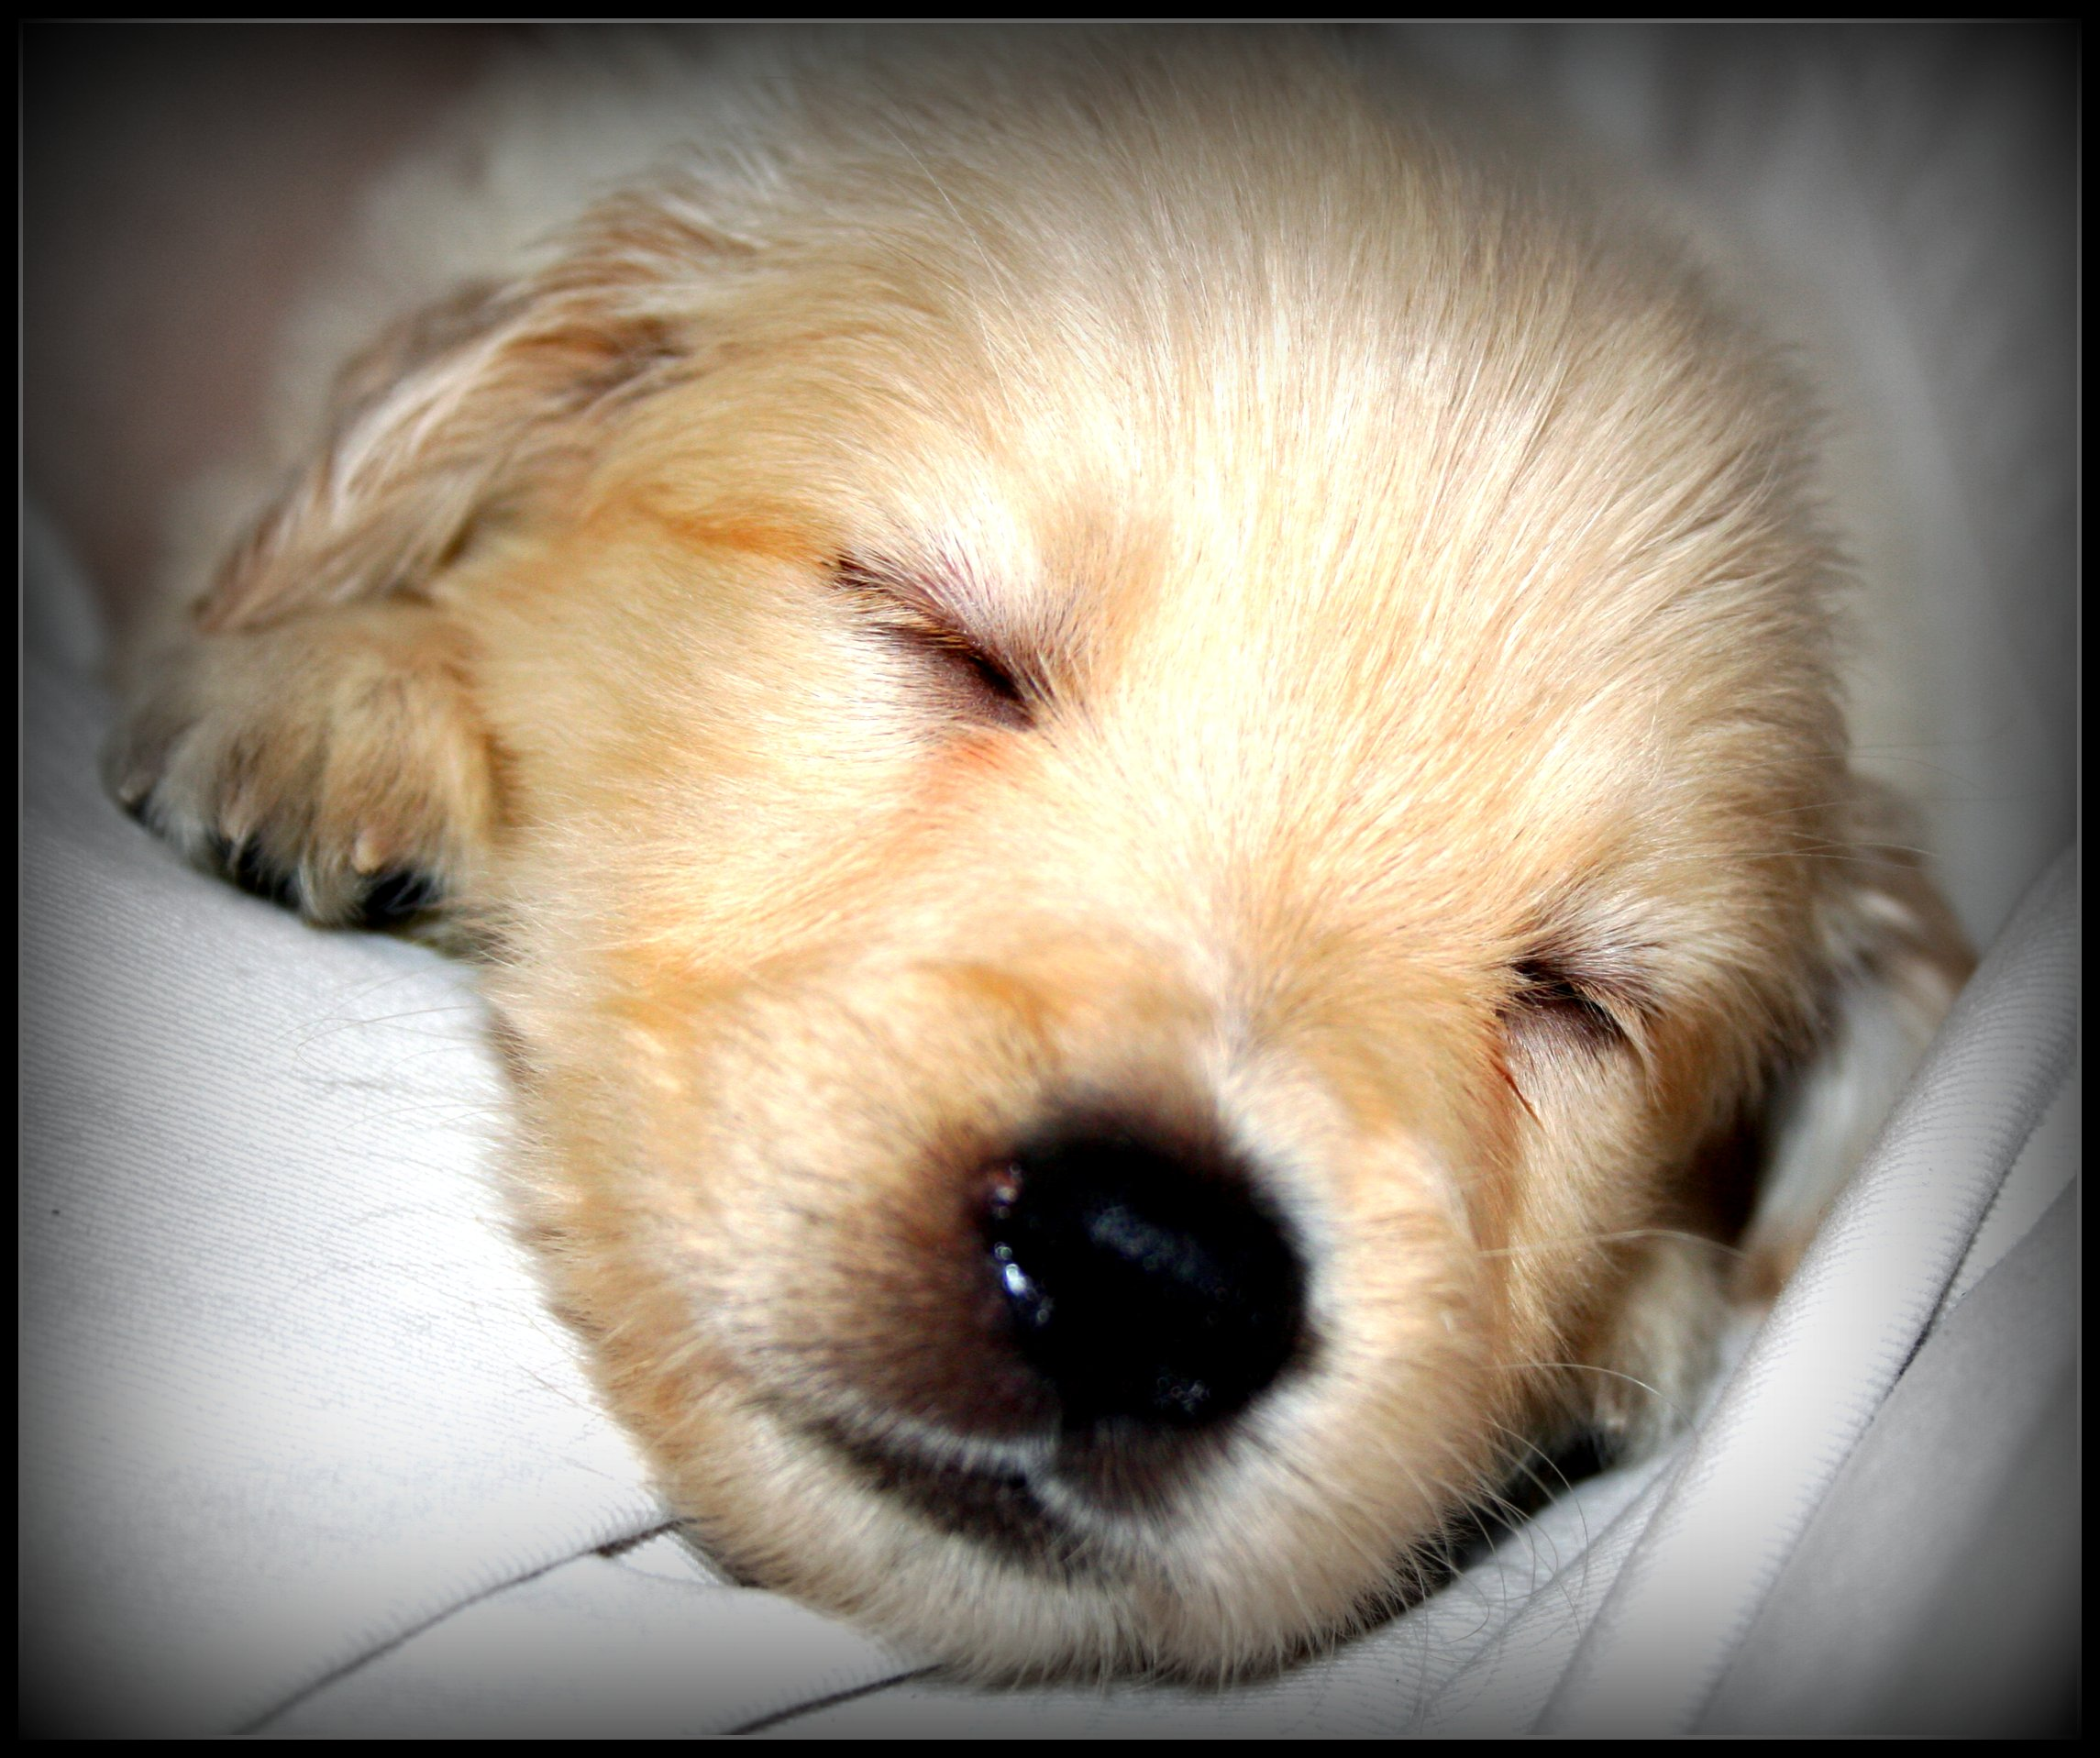 Galleries Related: Sweet Dreams Funny , Good Night Sweet Dreams ,